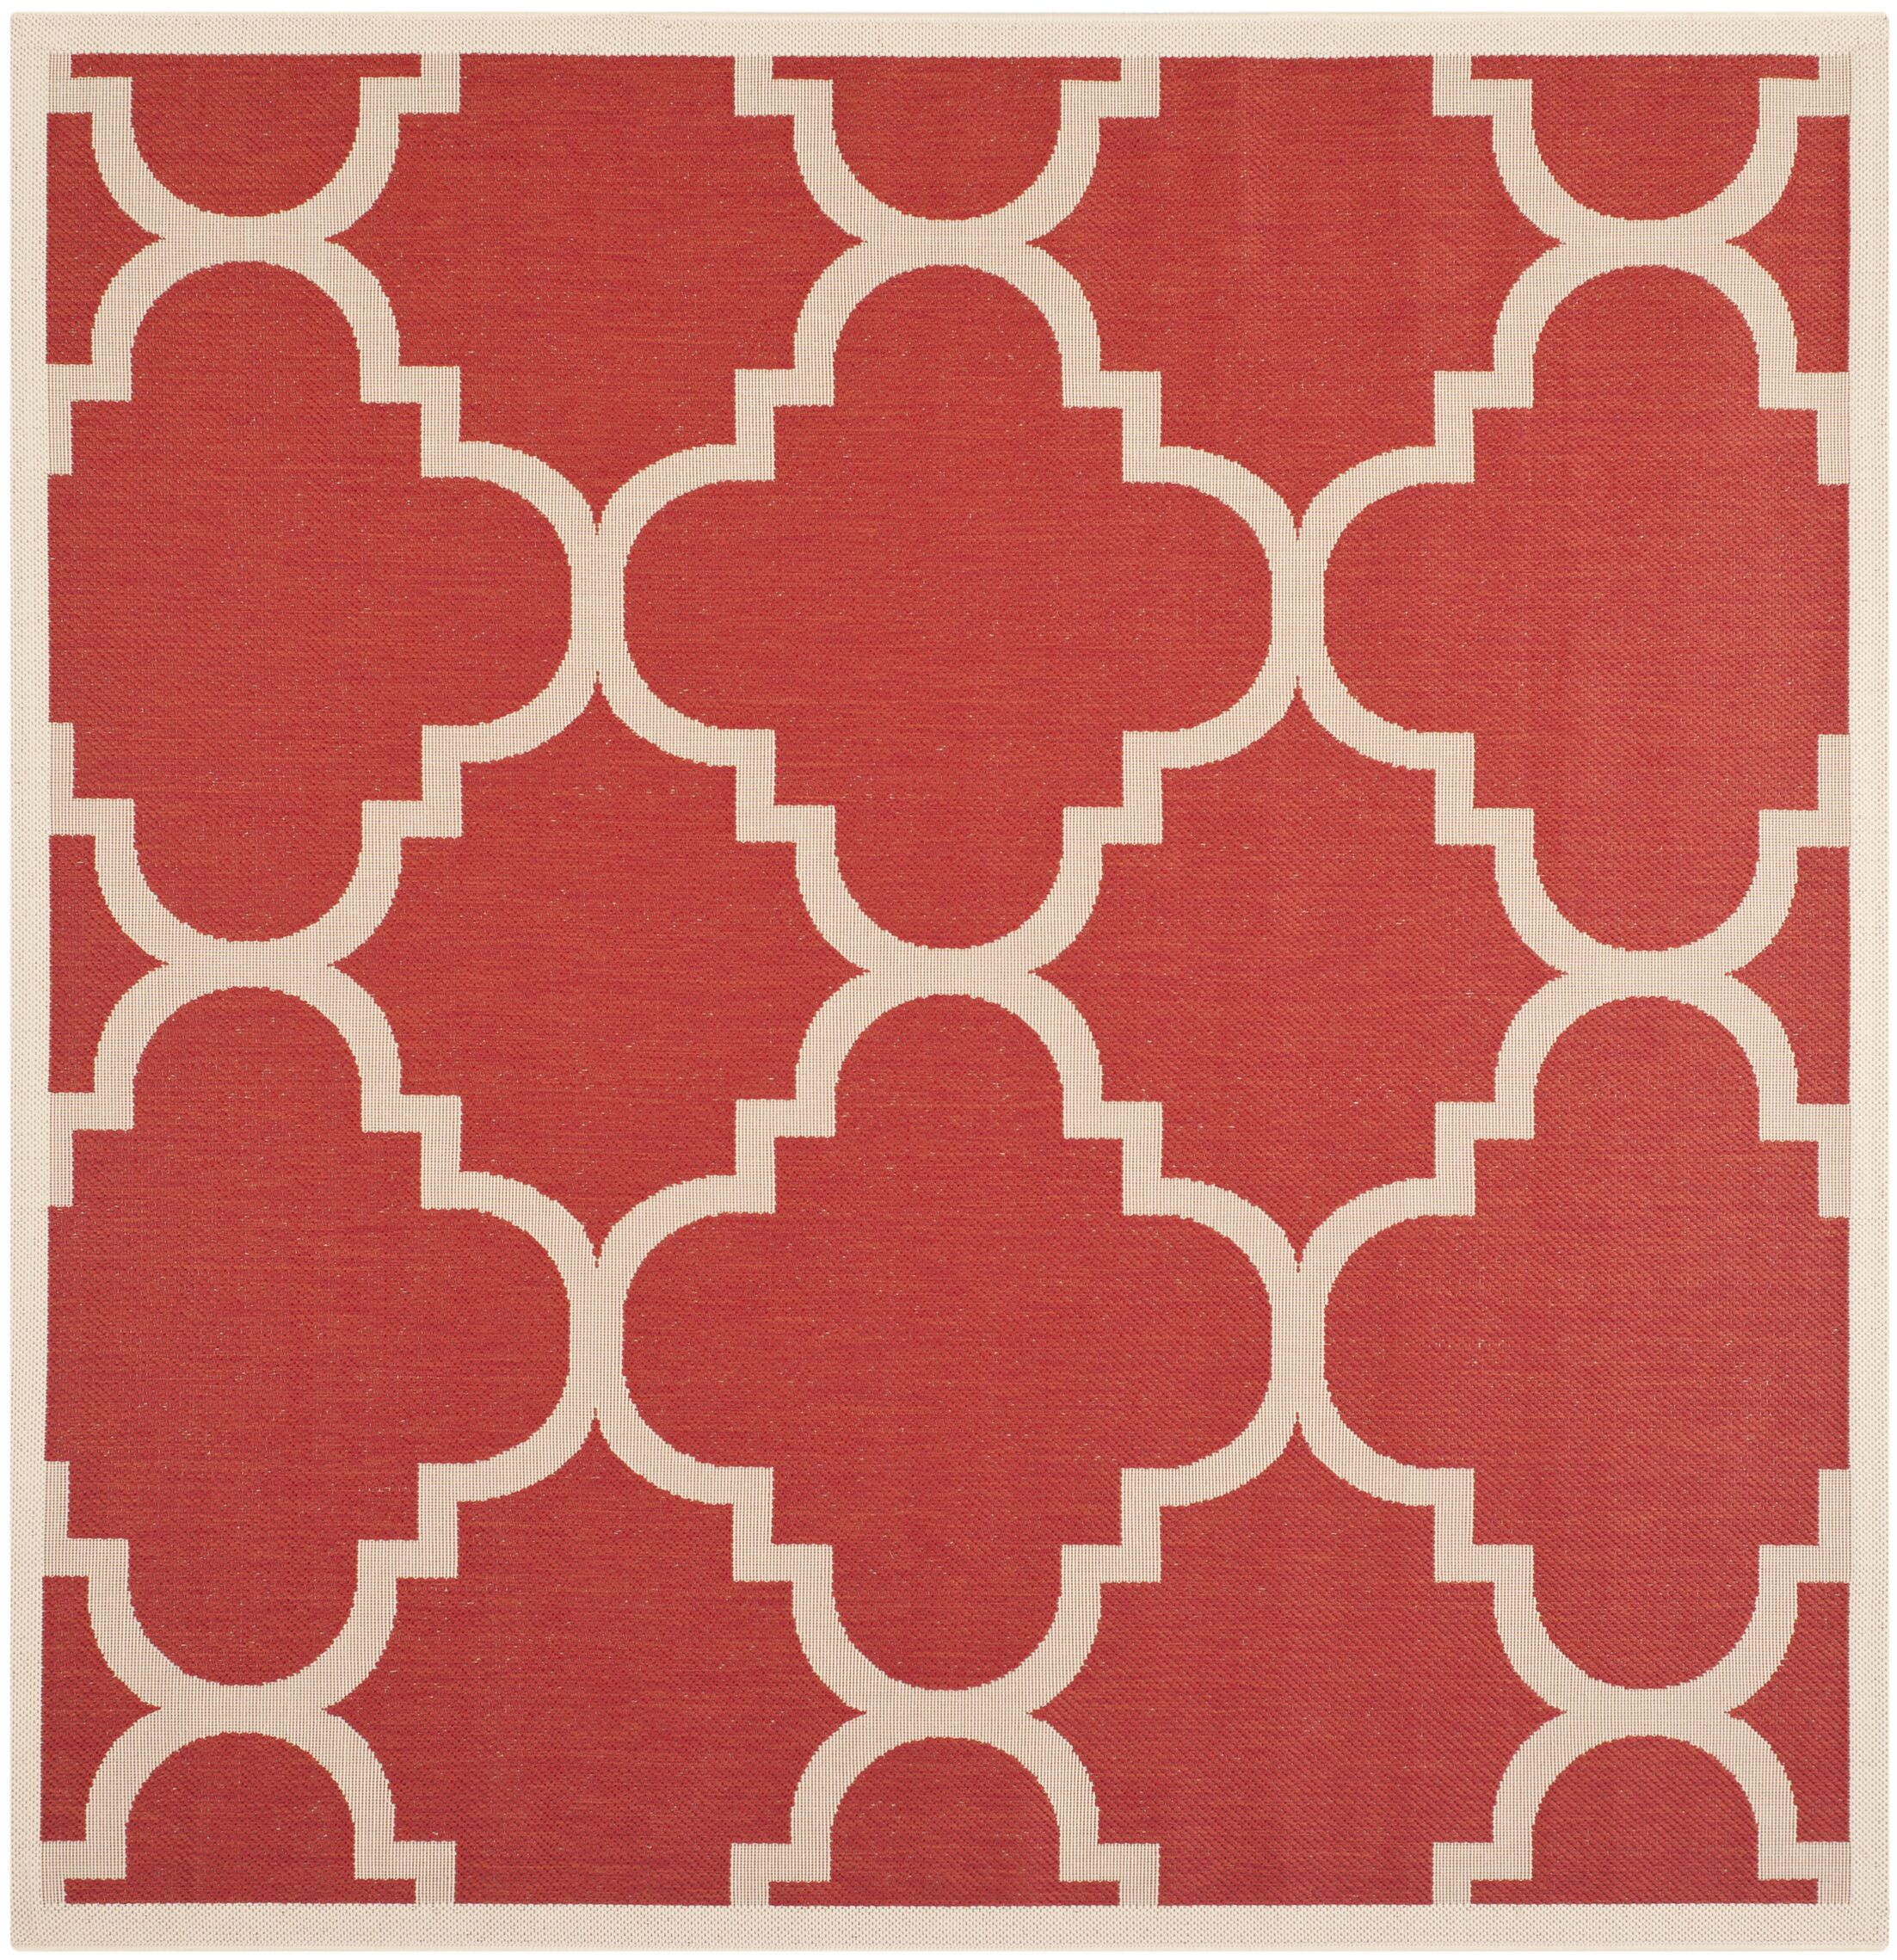 Short Red/Beige Indoor/Outdoor Area Rug Rug Size: Square 5'3